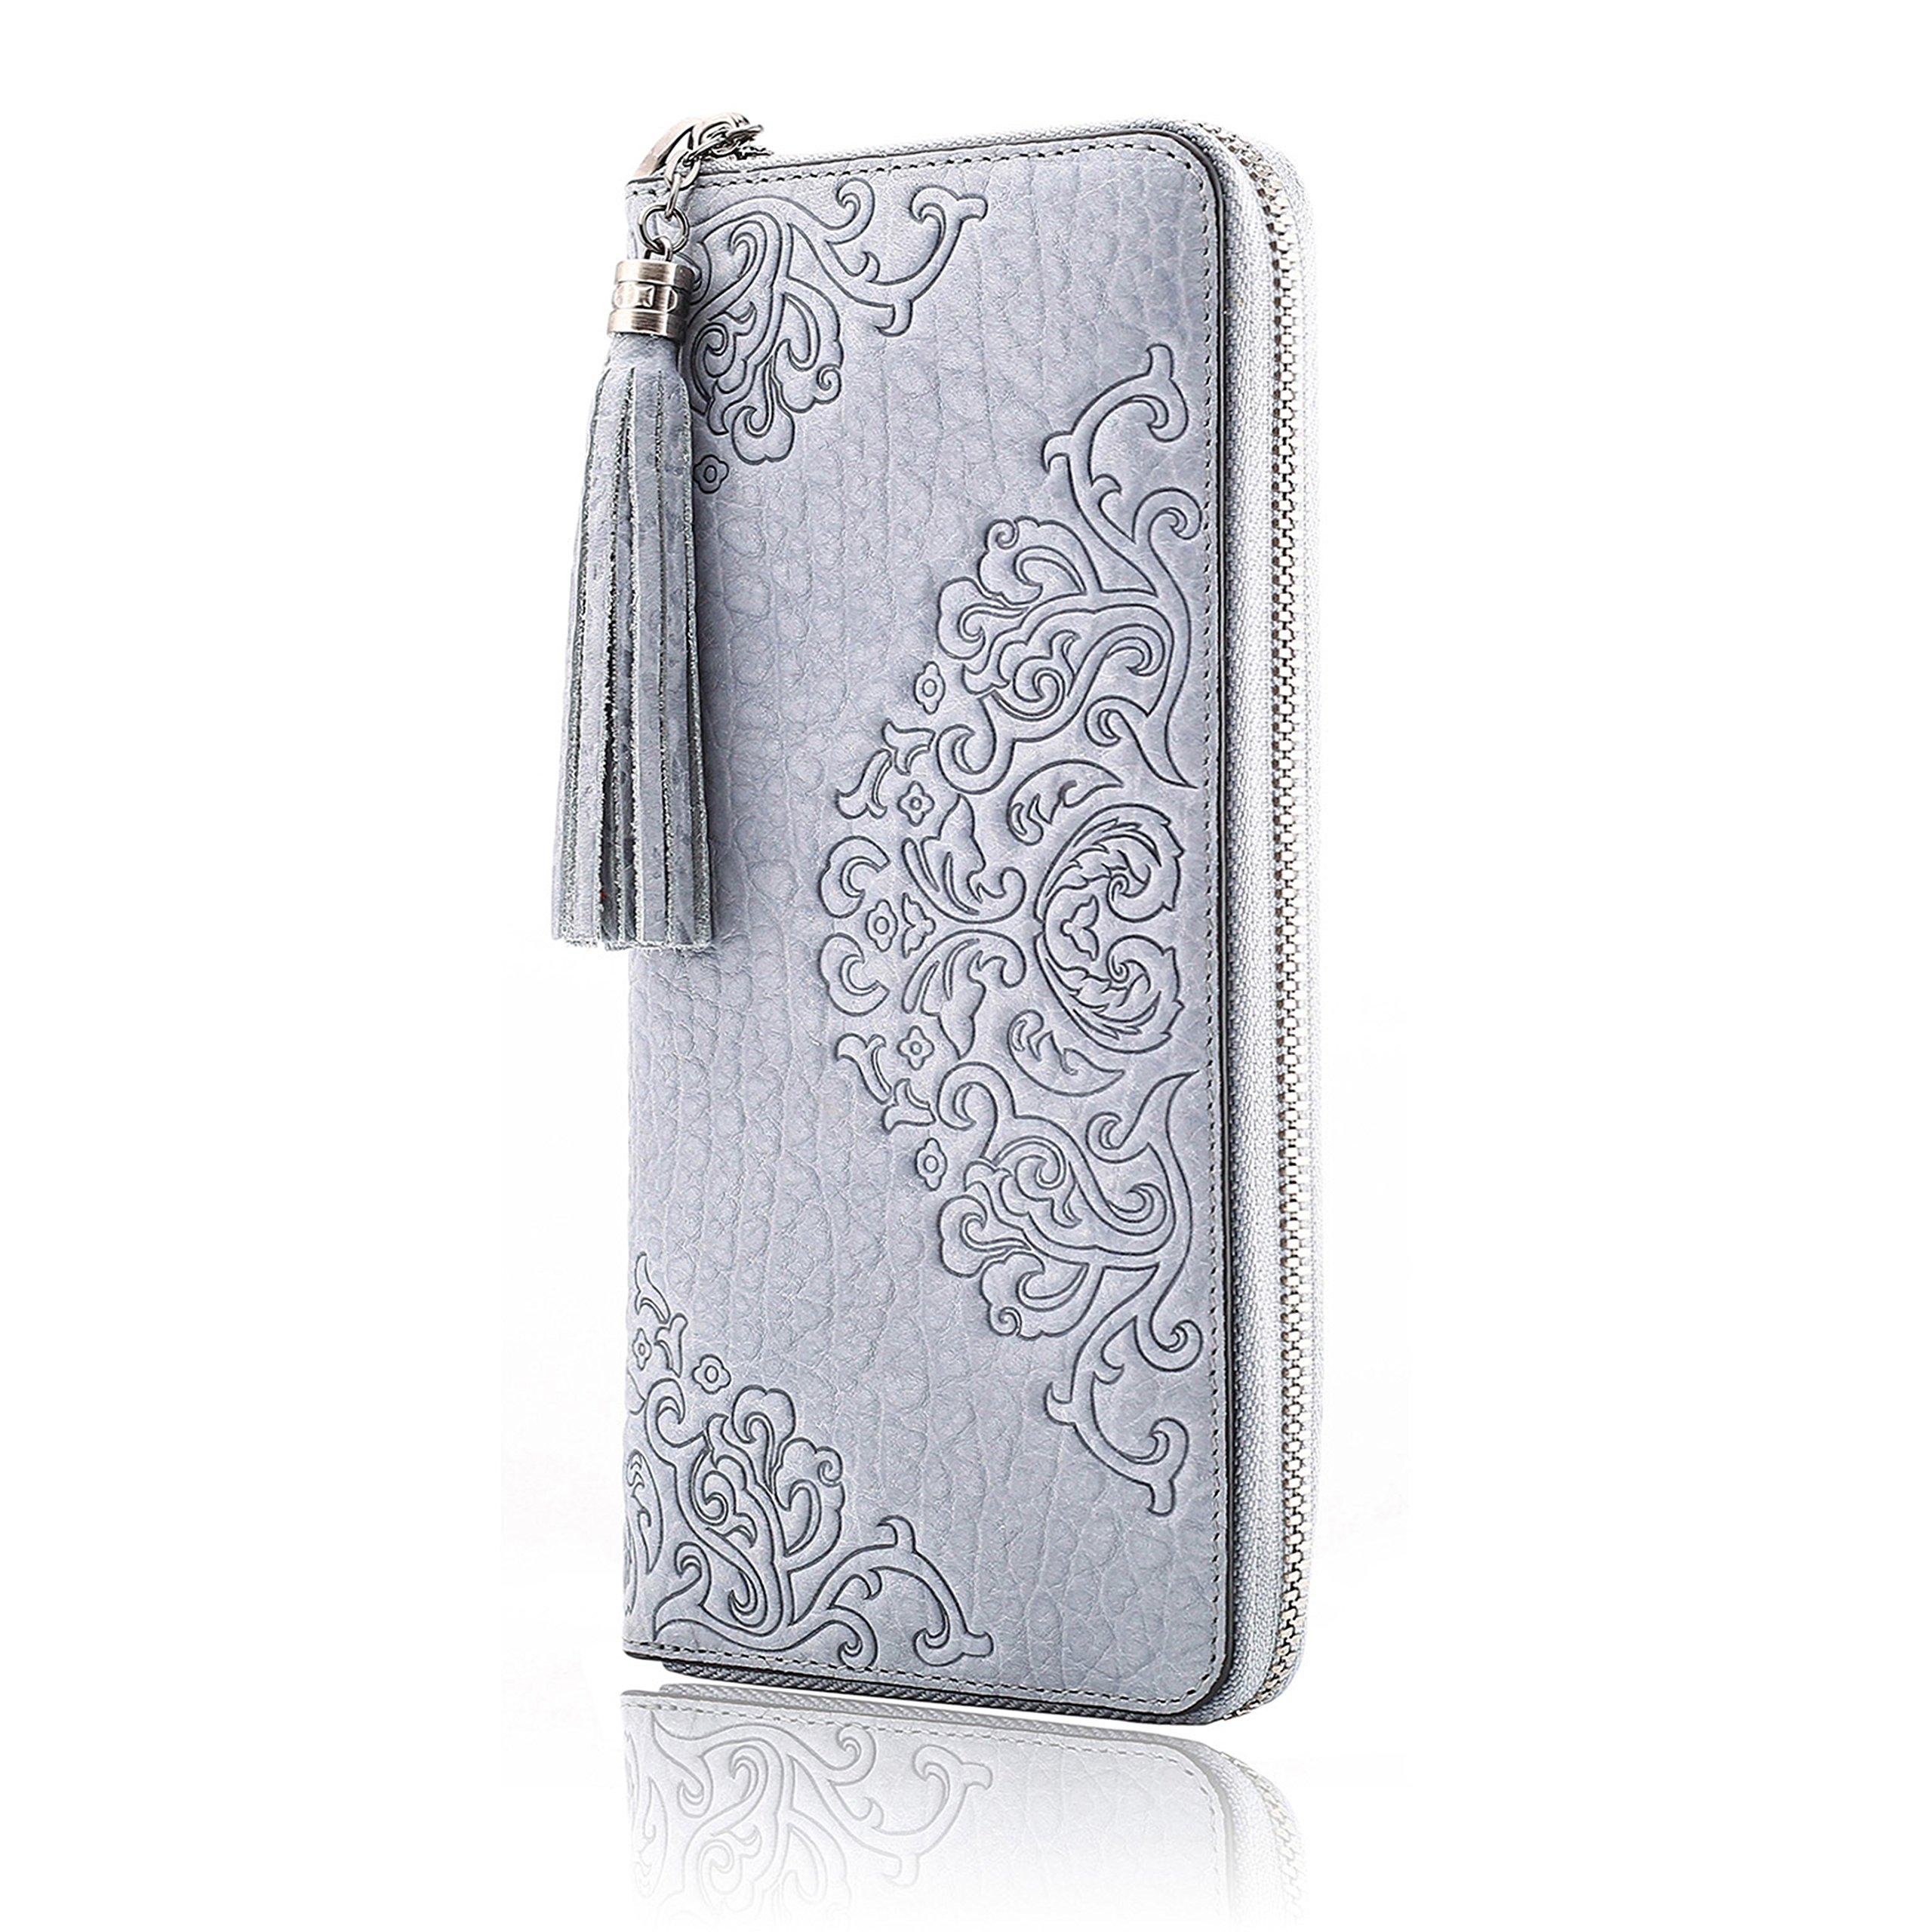 Naisibao Womens Embossed Floral Wallet Designer Handmade Genuine Leather Zip Around Long Clutch Wristlet Card Holder Purse